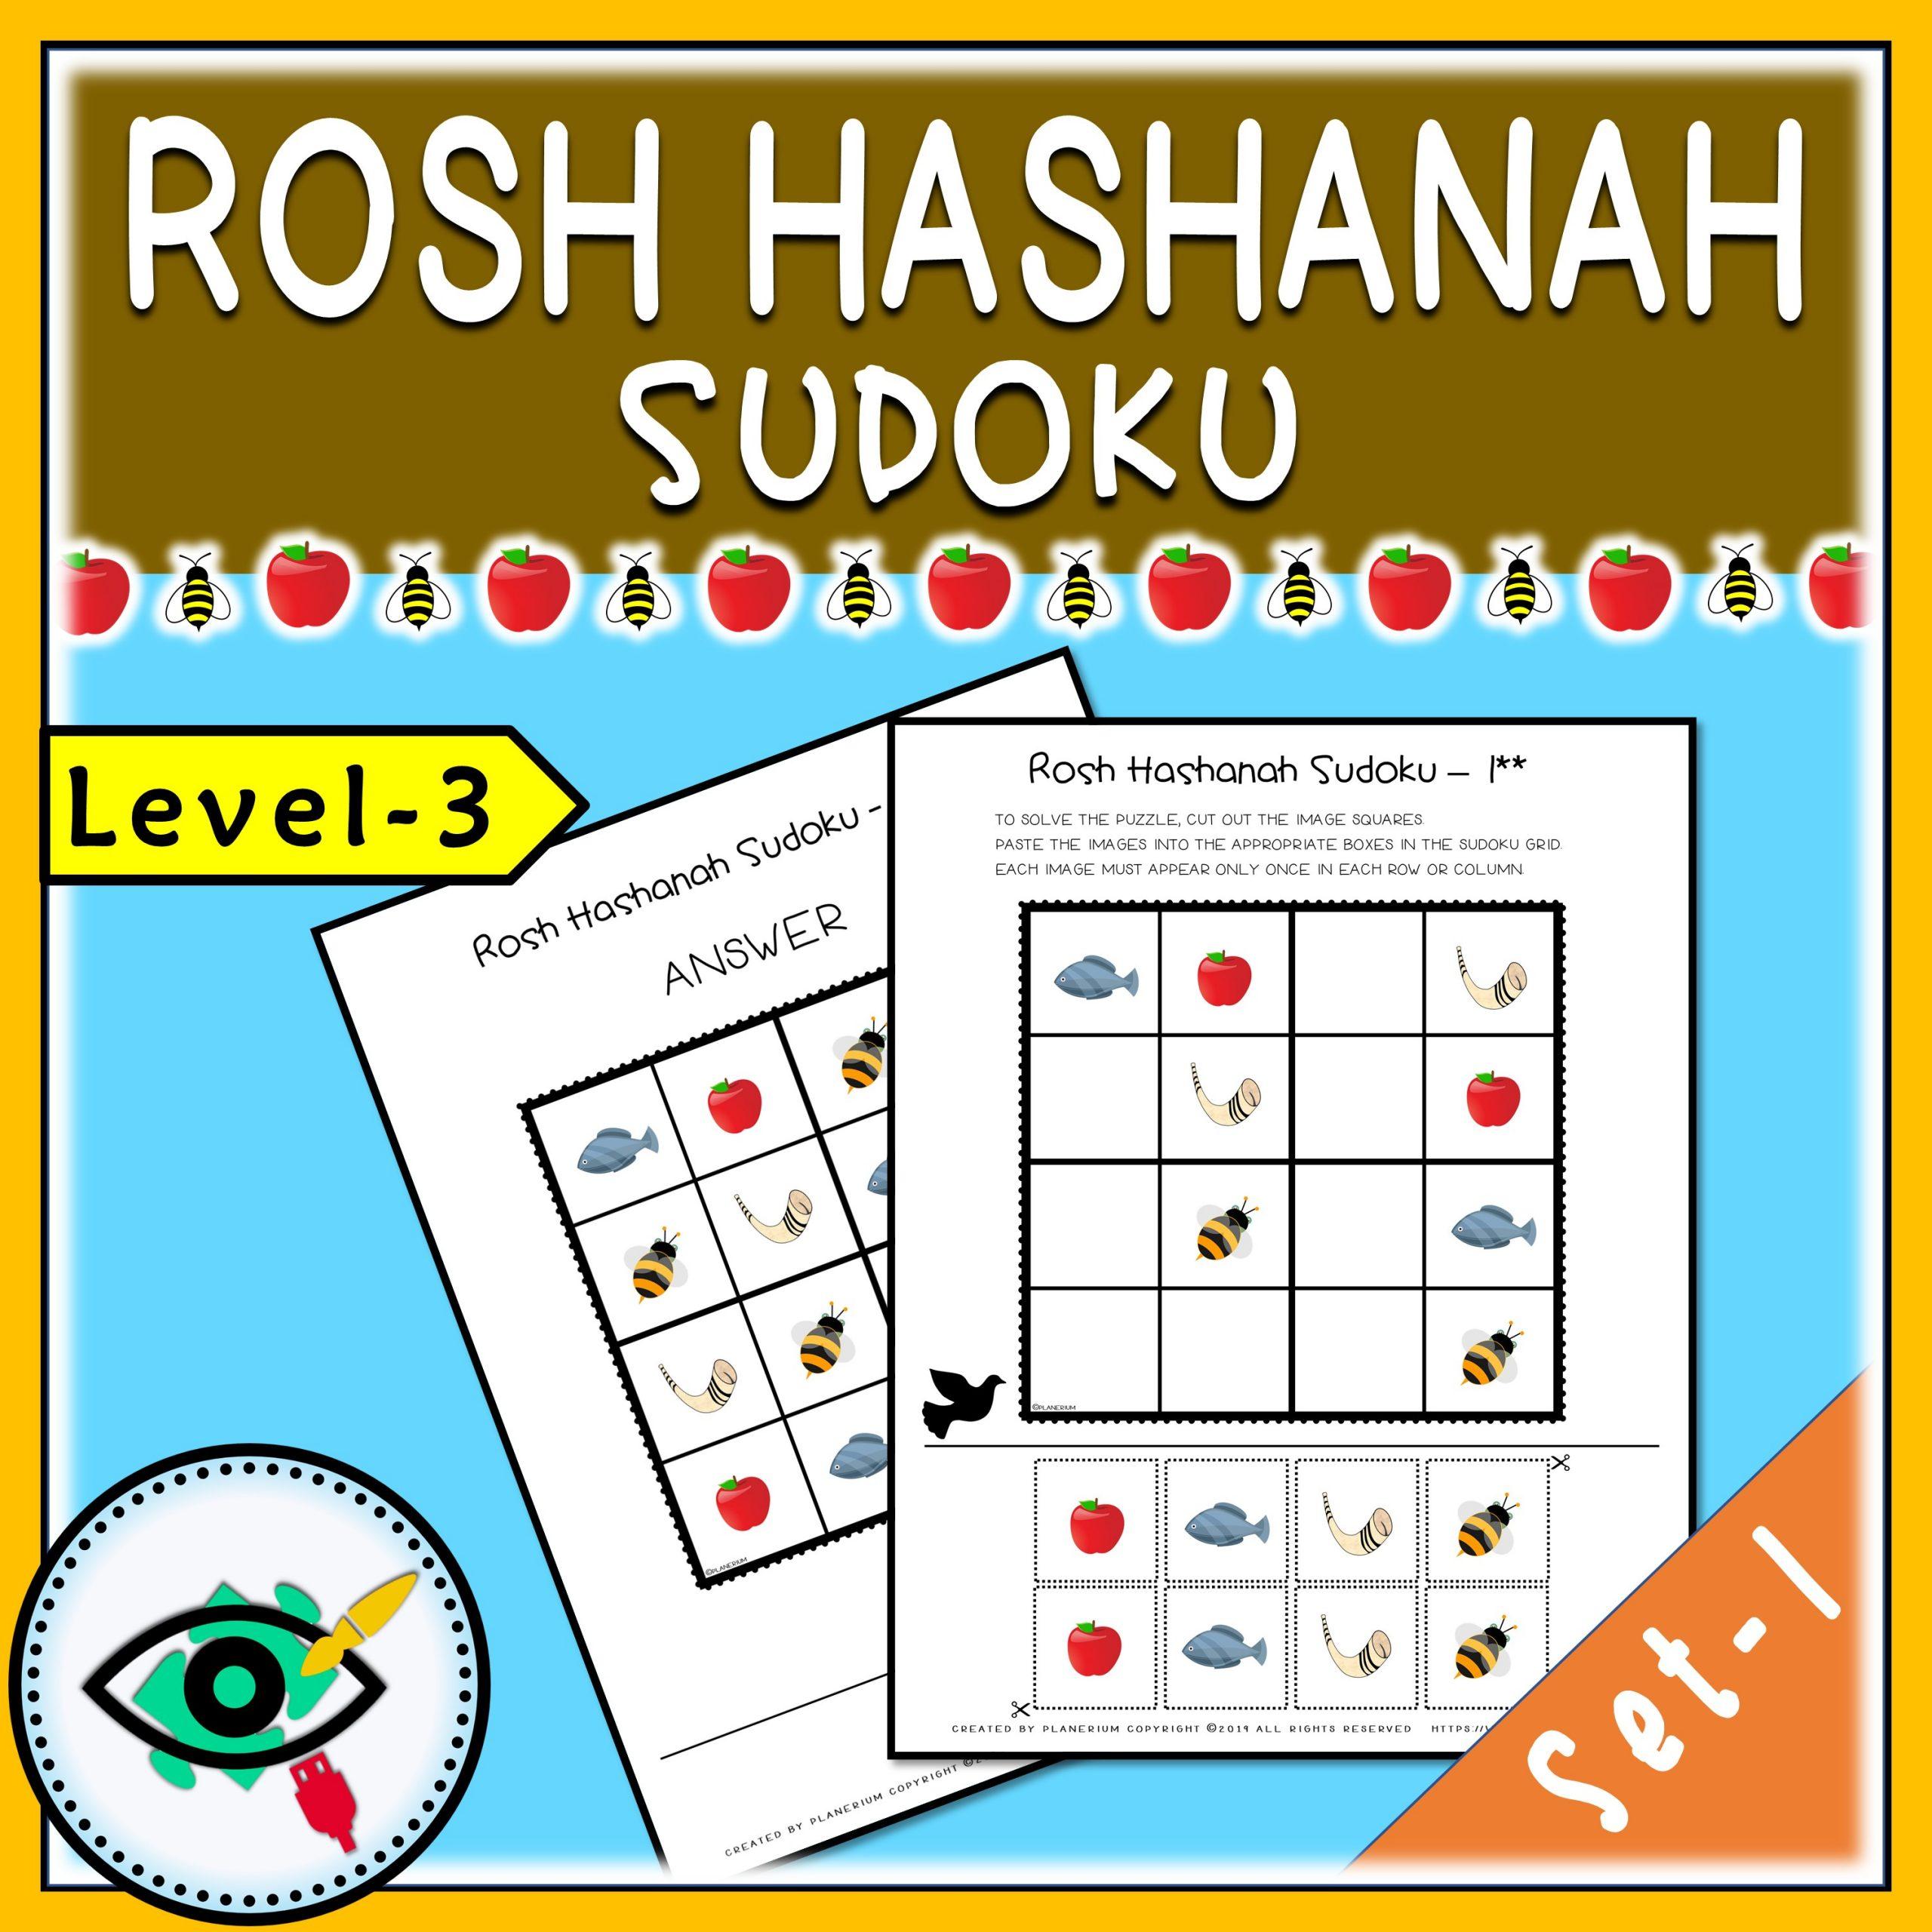 Rosh-Hashanah - Sudoku Puzzle - Title 3